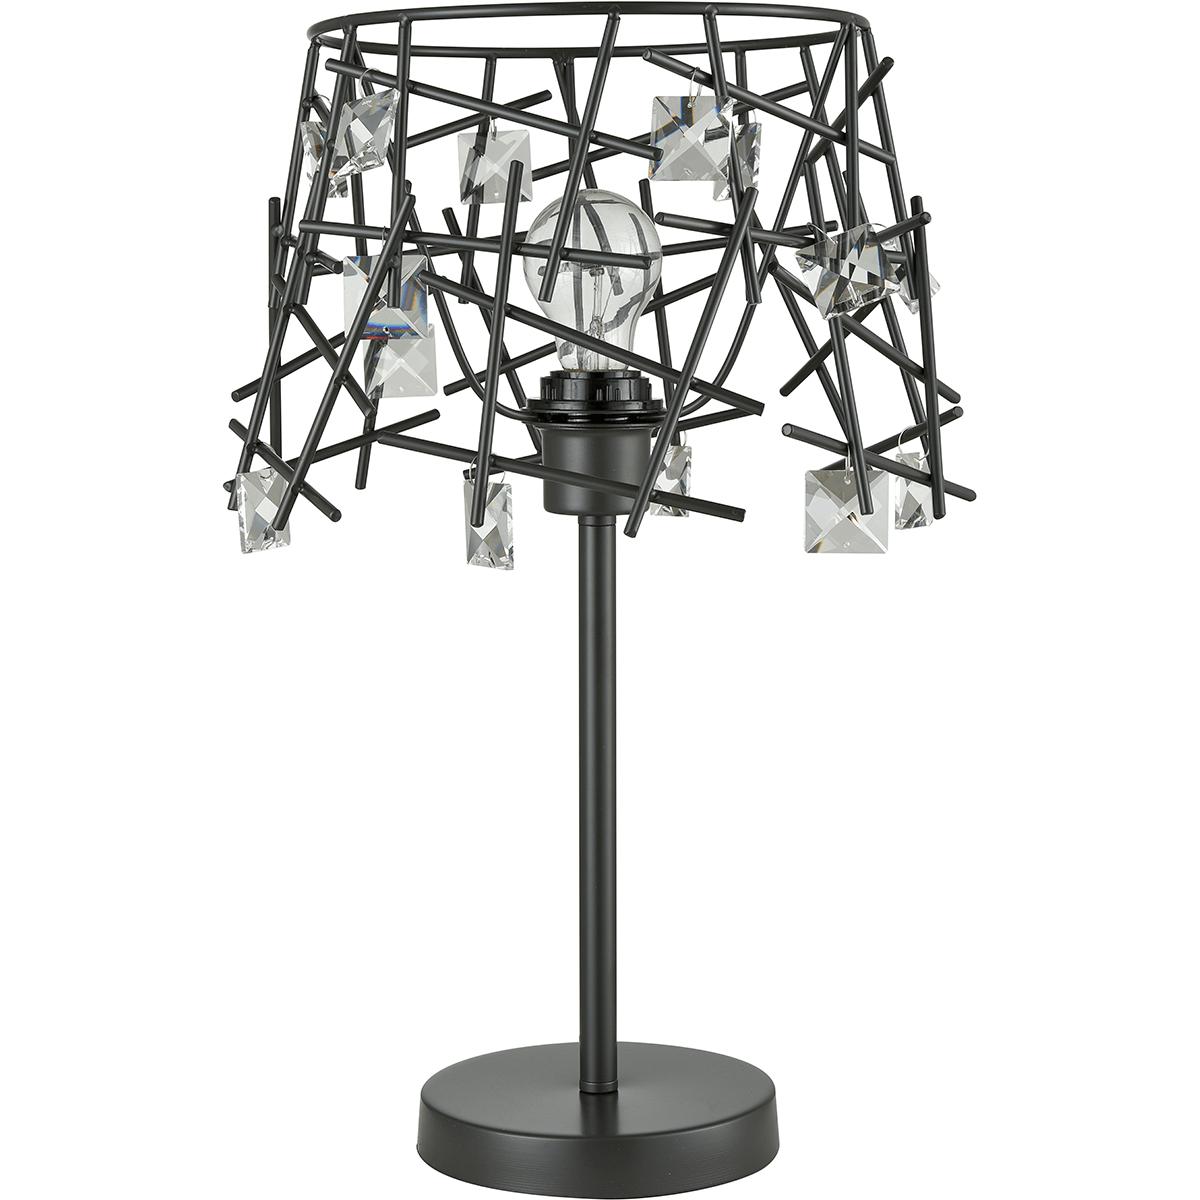 Настольная лампа Vele Luce Assoluto VL1532N01 настольная лампа декоративная vele luce toppi vl1841n01